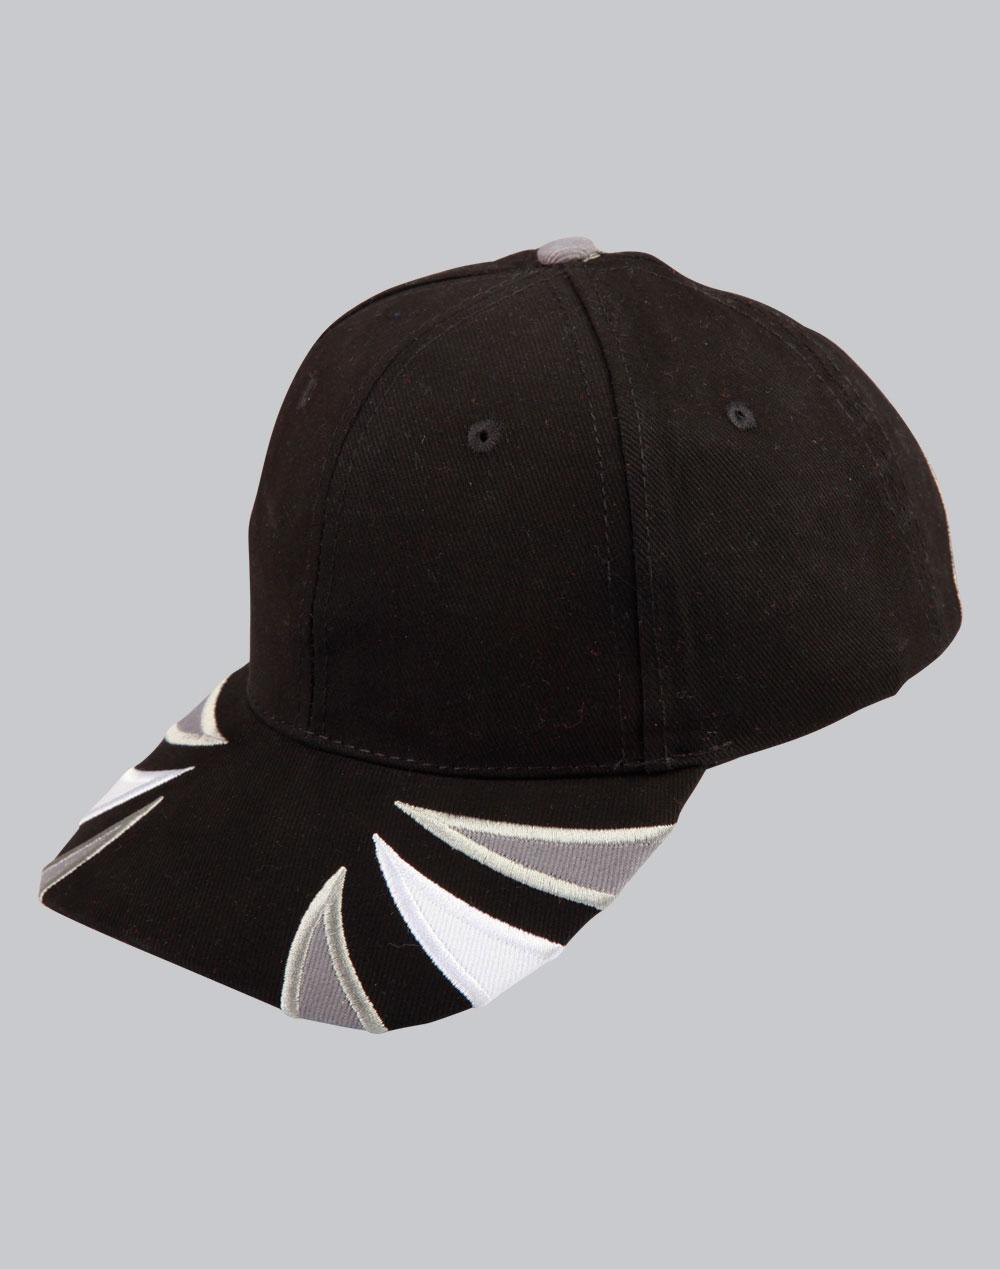 https://s3-ap-southeast-1.amazonaws.com/ws-imgs/CAPS/CH80_Black.White.Grey_ThreeQtr.jpg